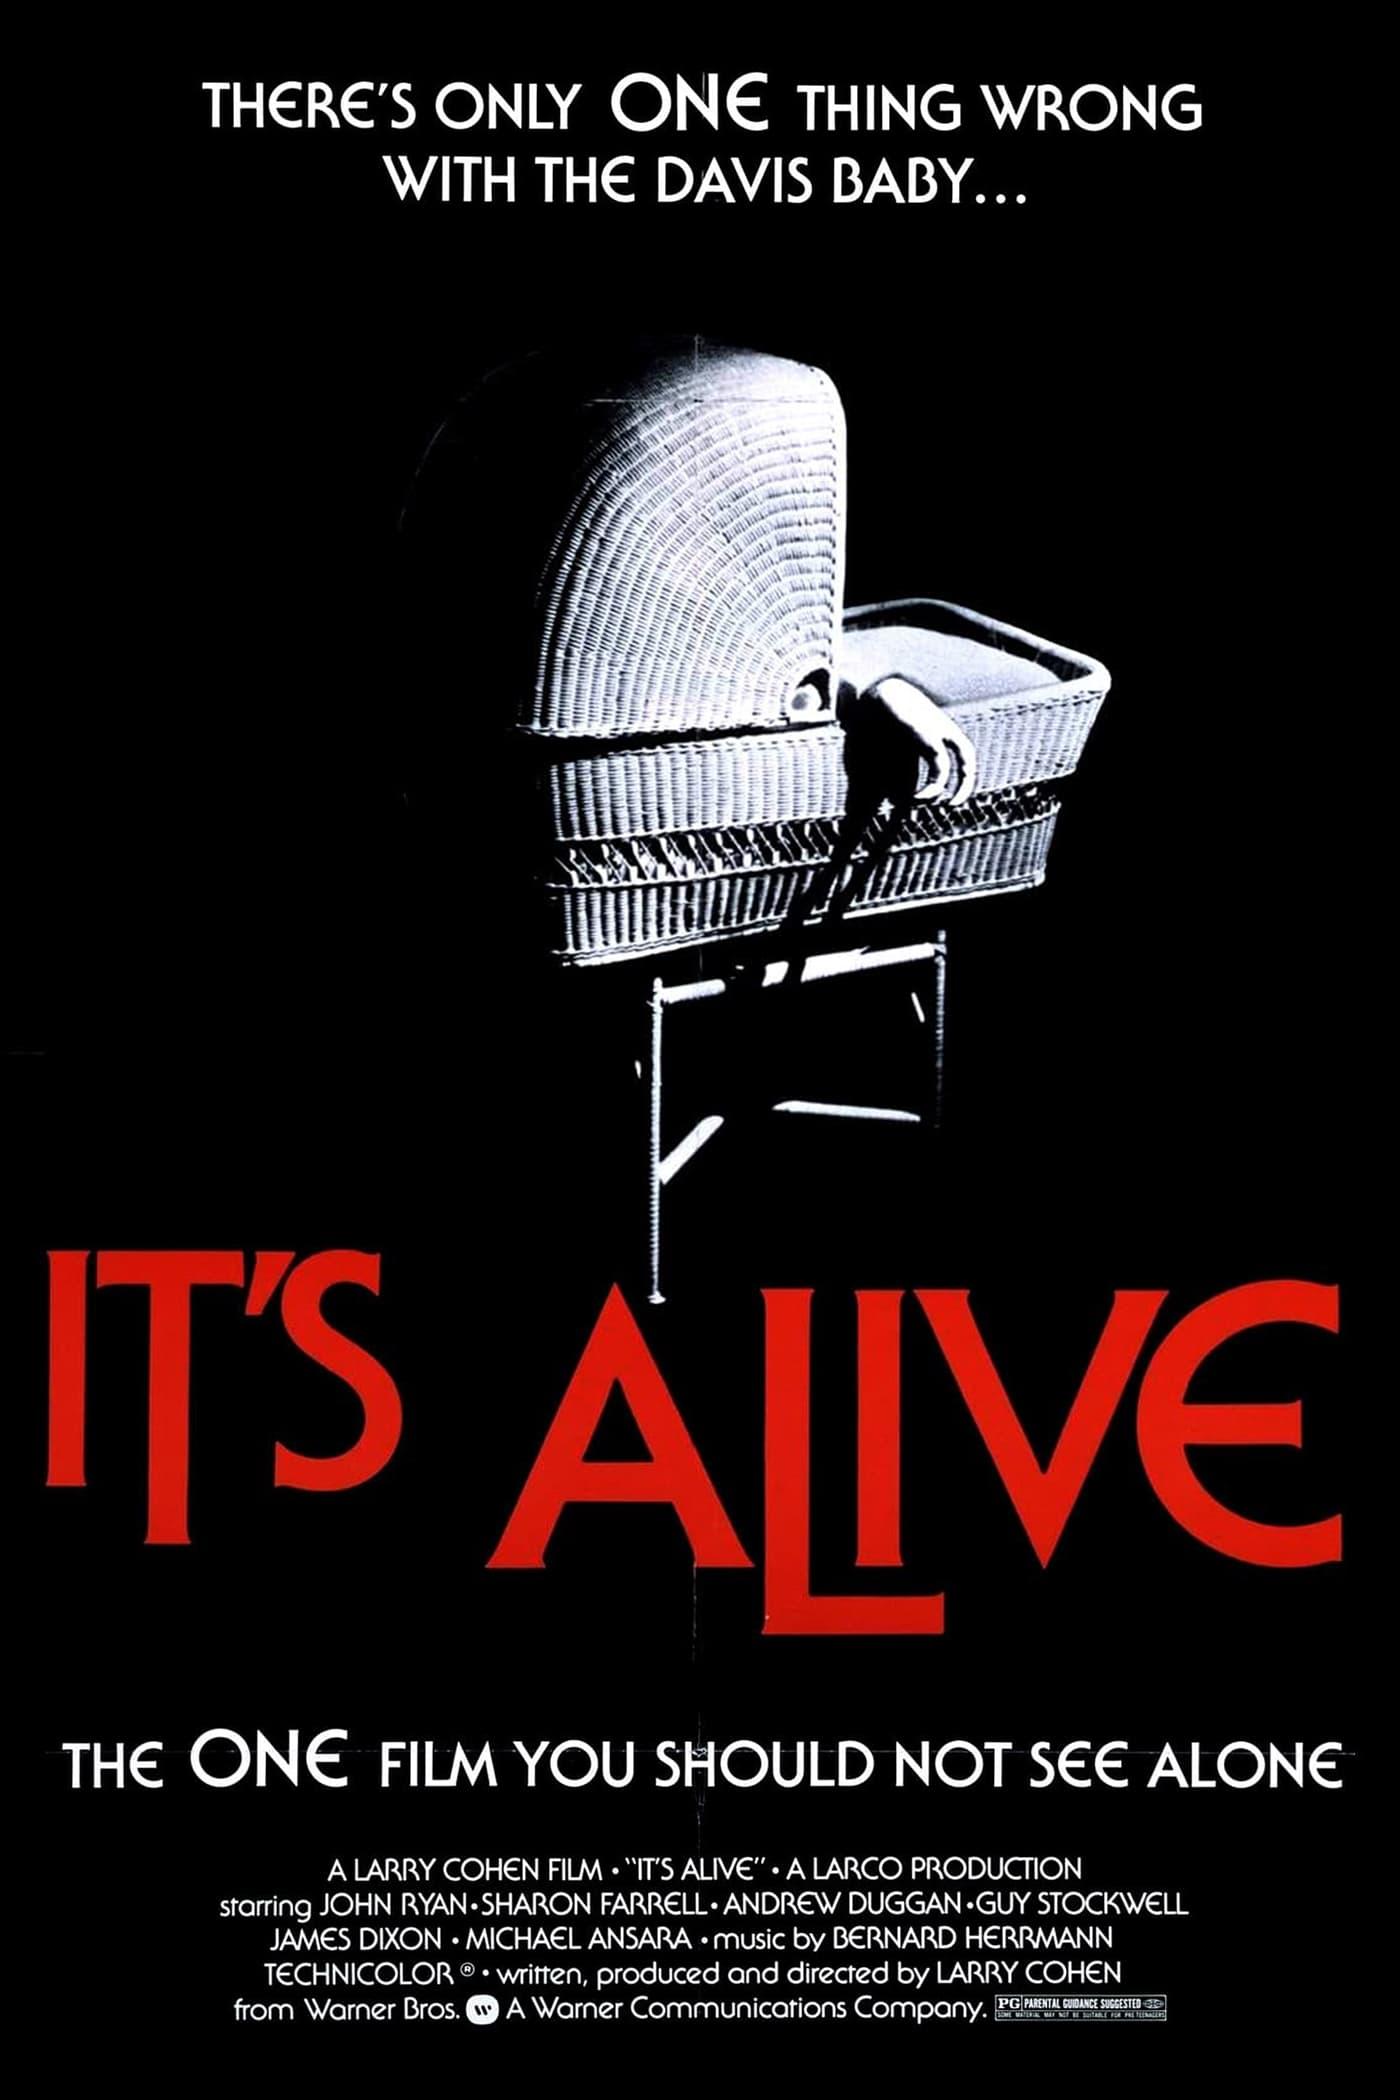 It's Alive / Το Τέρας